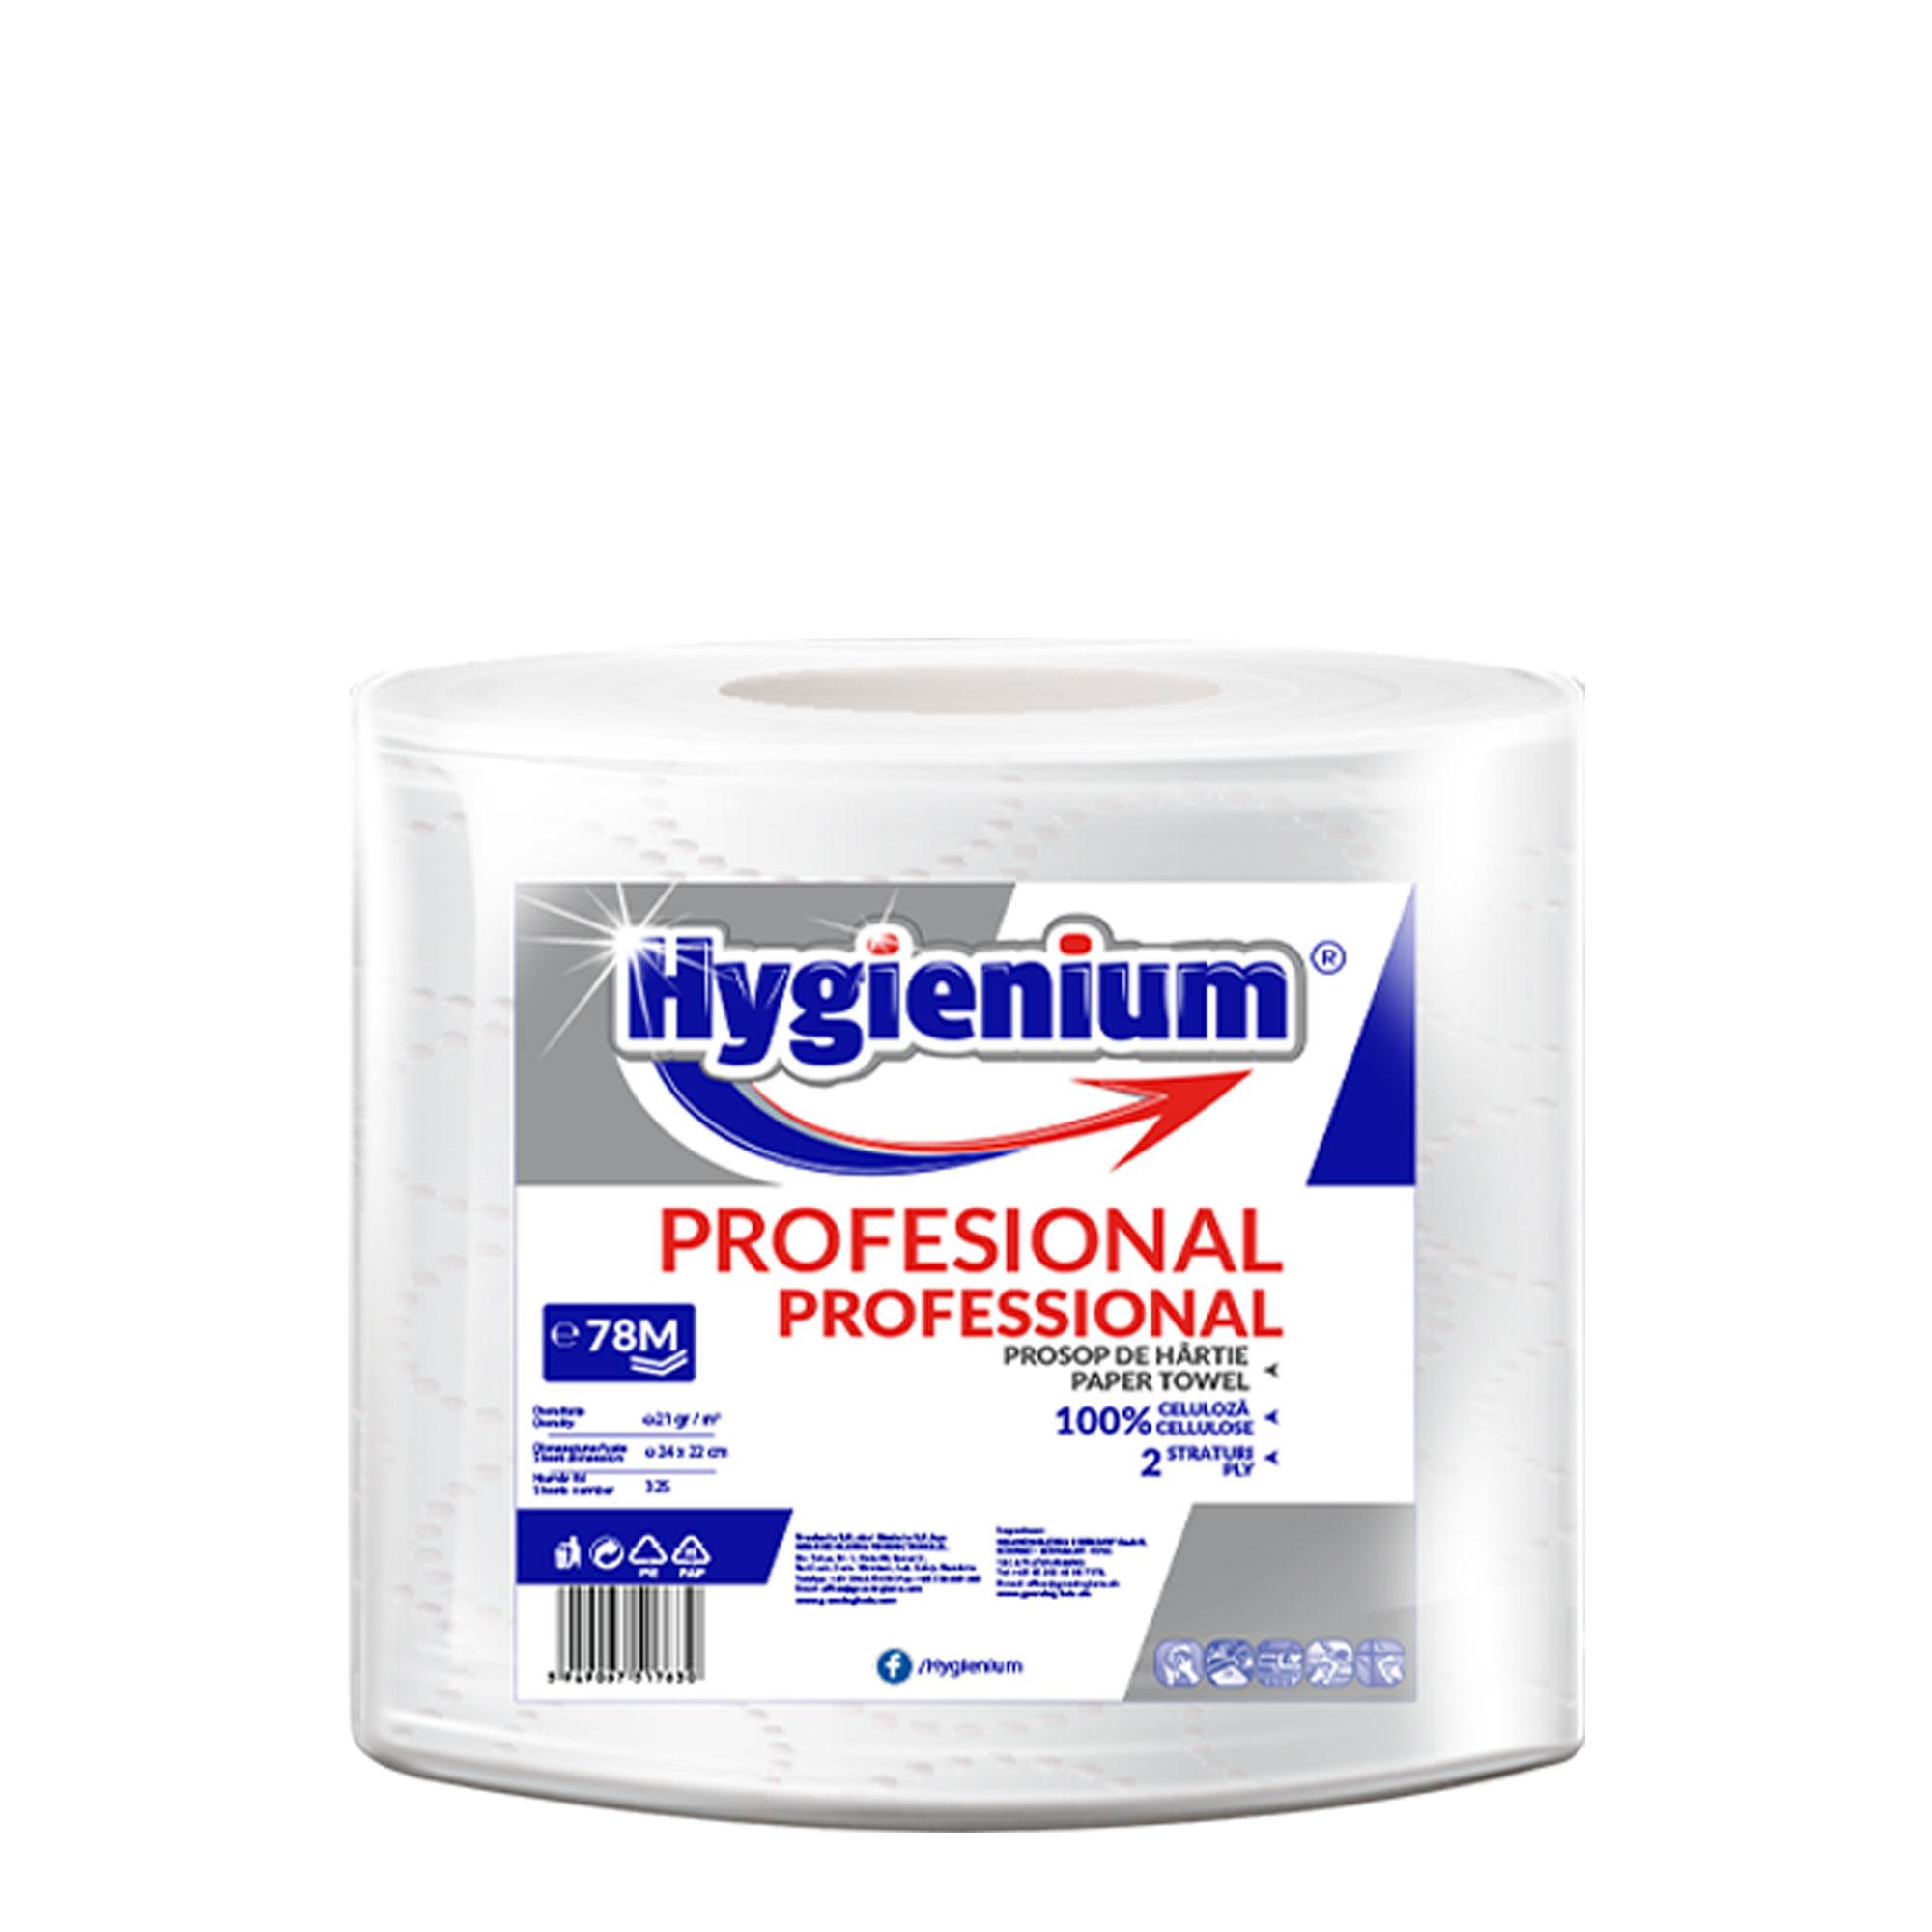 Hygienium Professional Papiertuch 78 M.